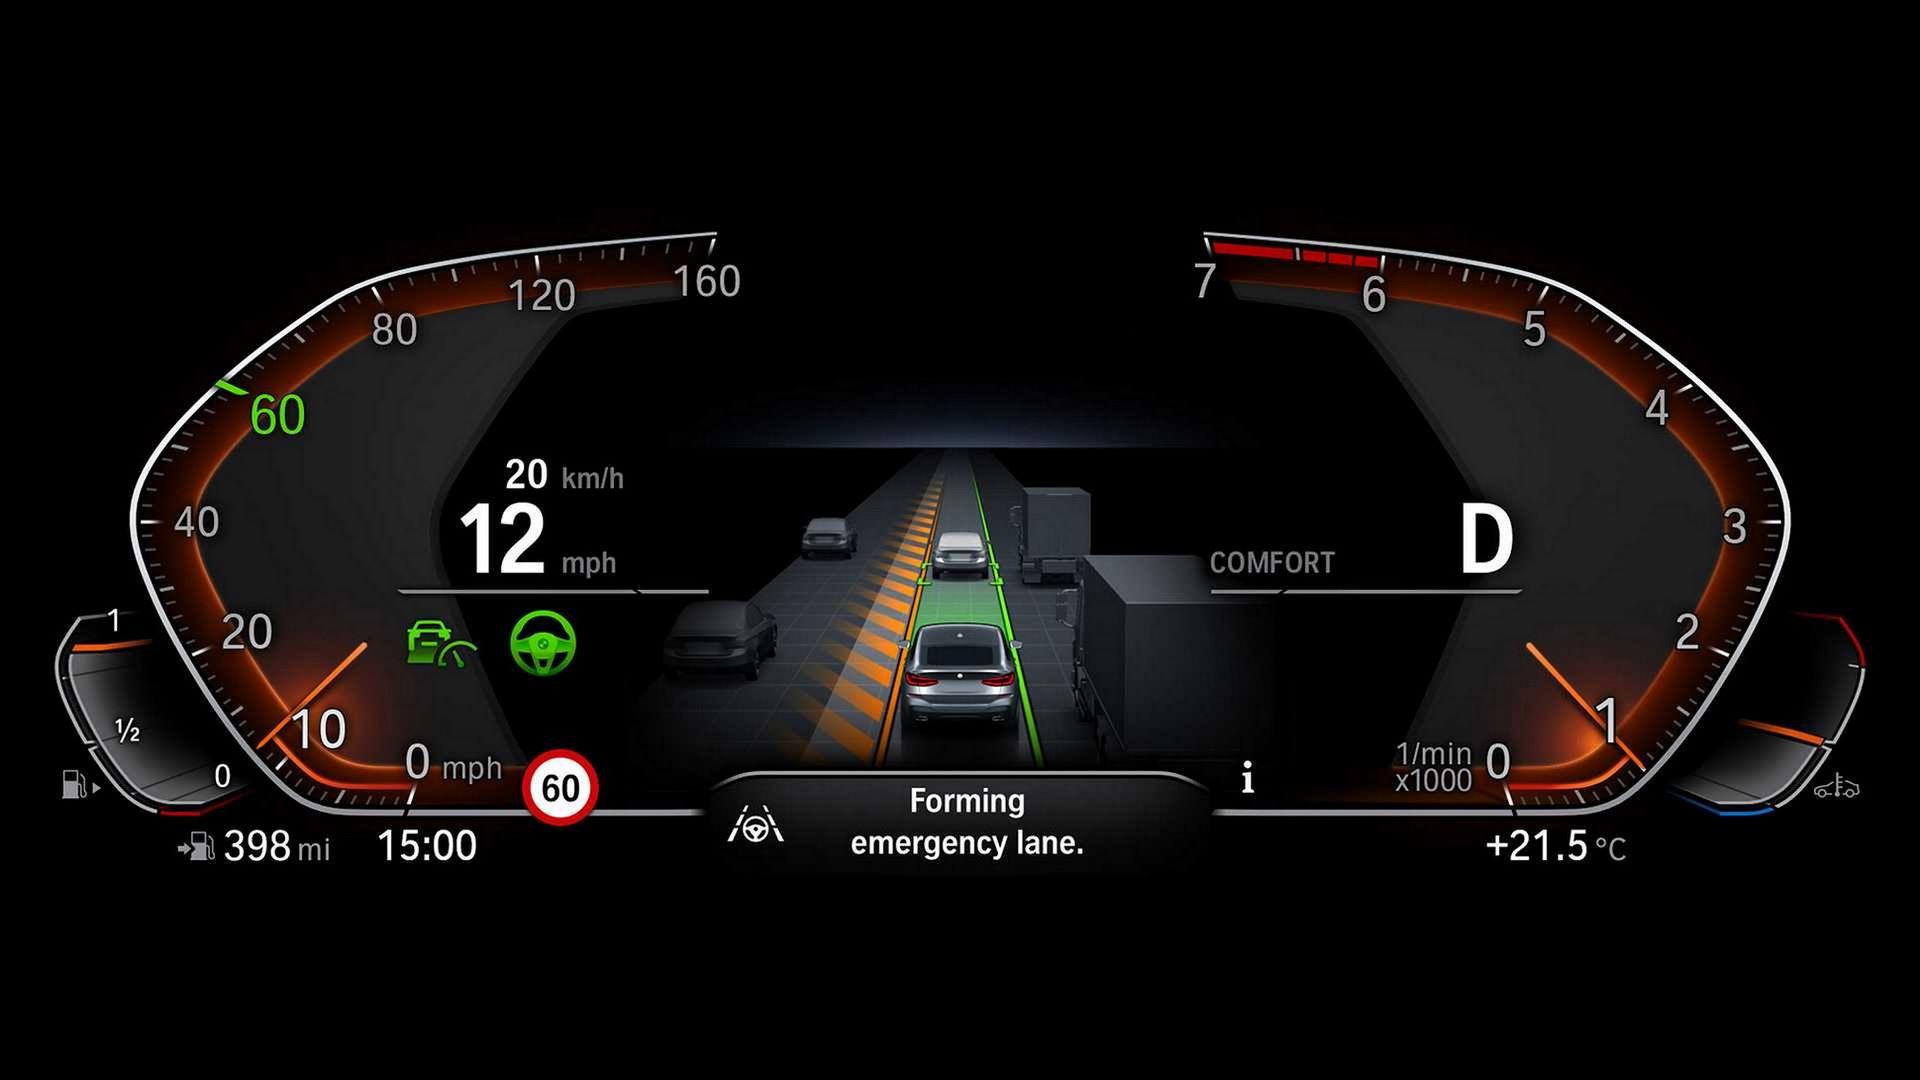 BMW-6-Series-GT-Gran-Turismo-facelift-2021-29